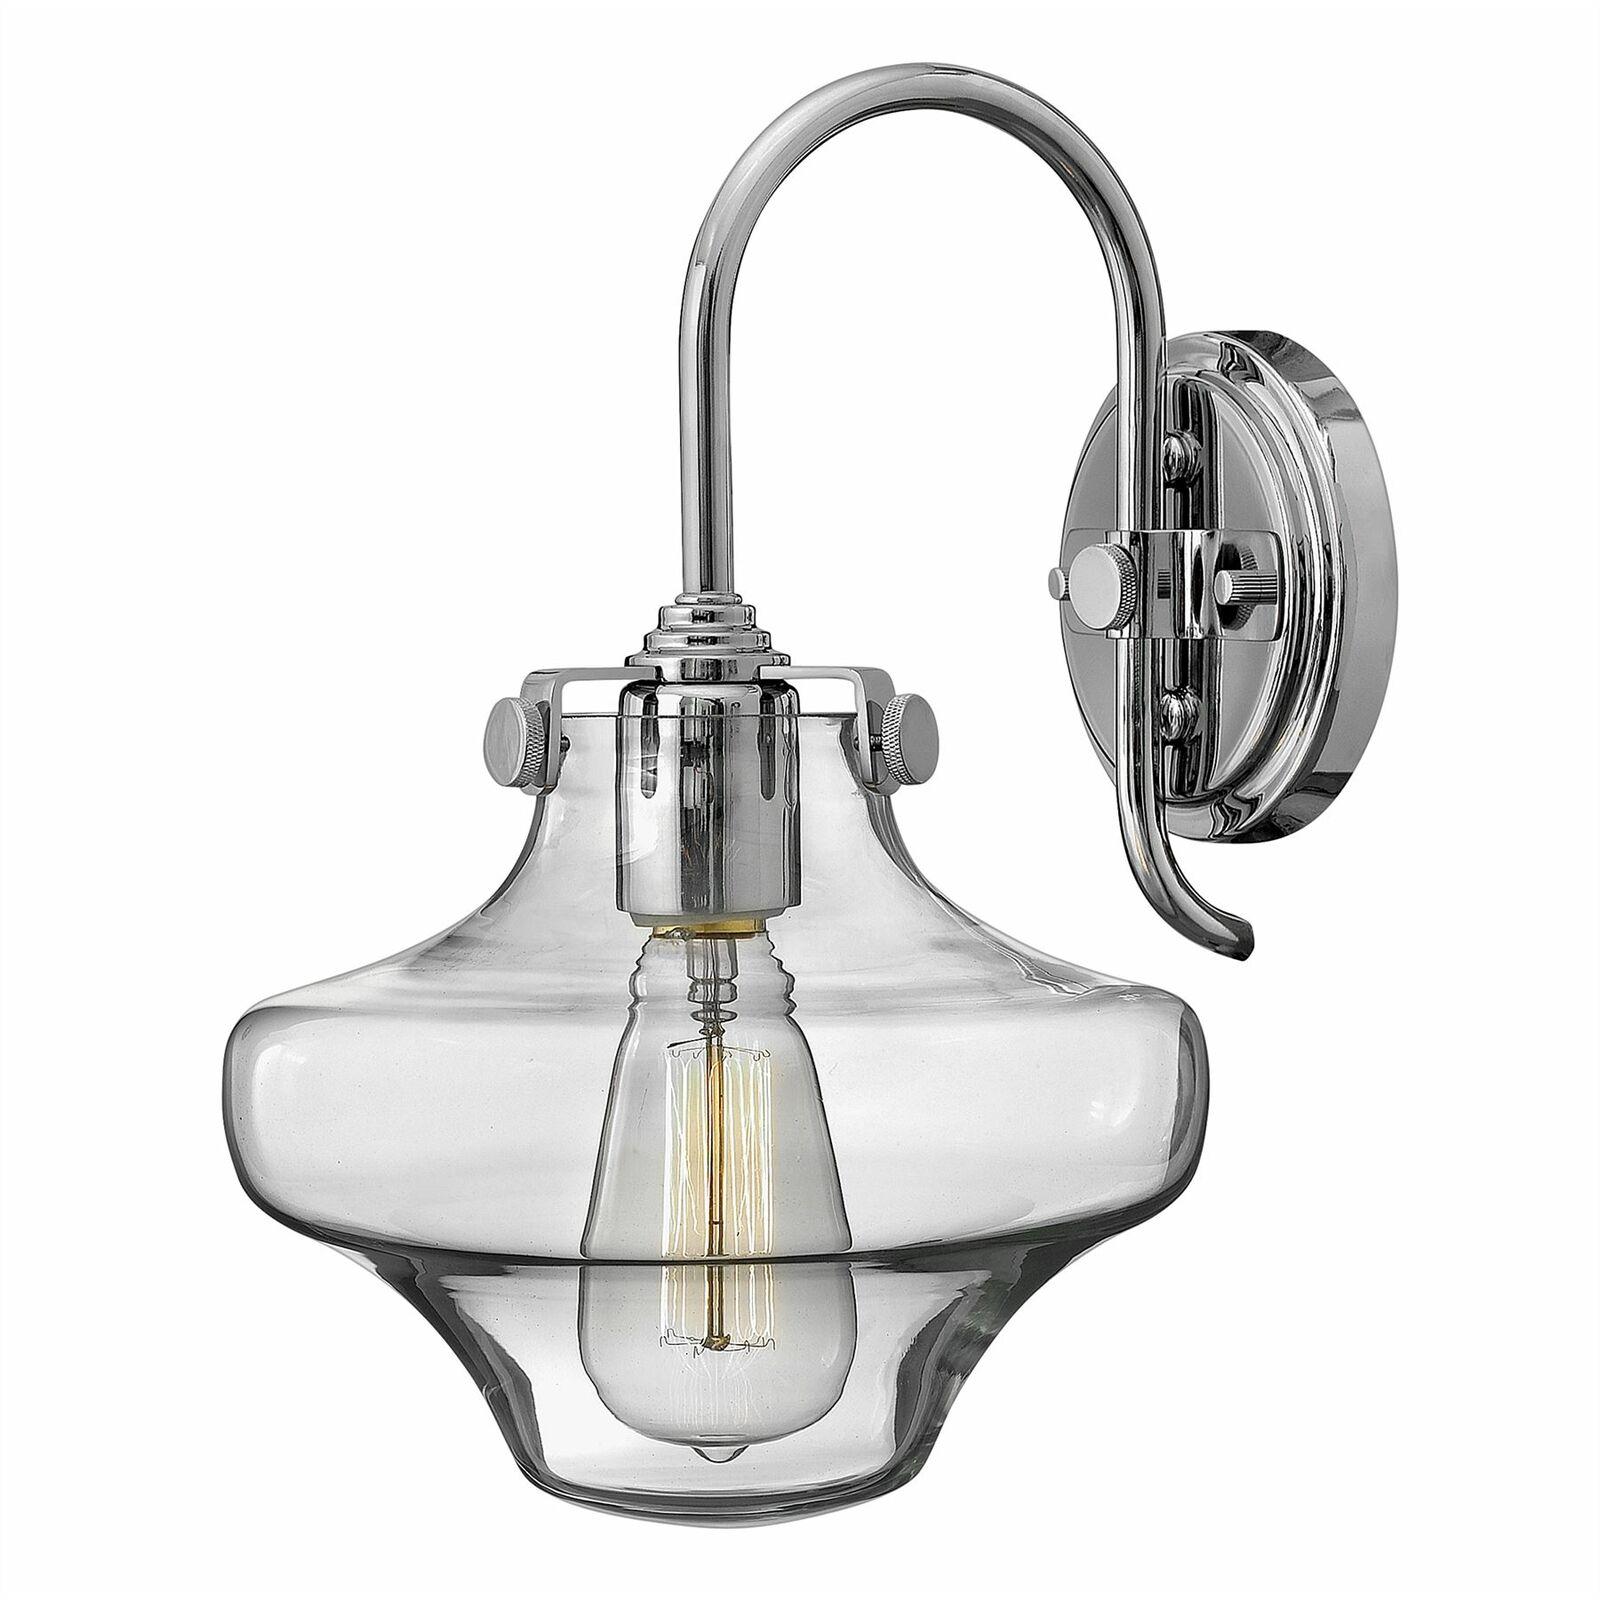 Hinkley Lighting - Congress 1 Light Clear Glass Wall Light - Chrome